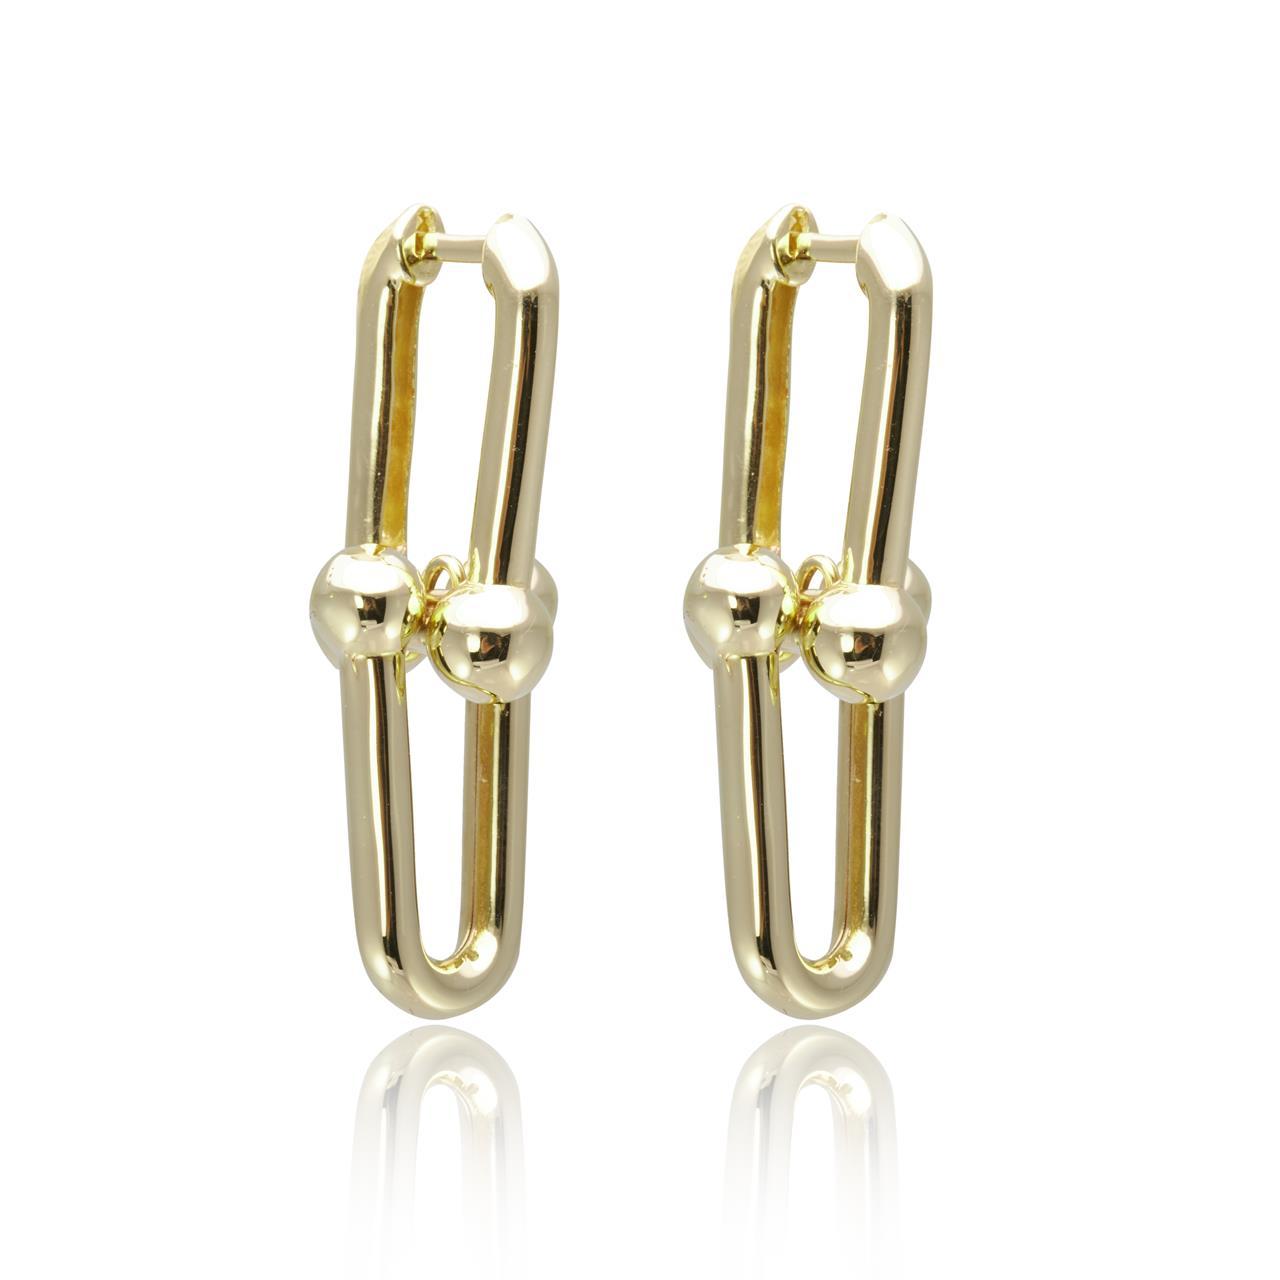 Cetaş Altın Tiffany Model Küpe